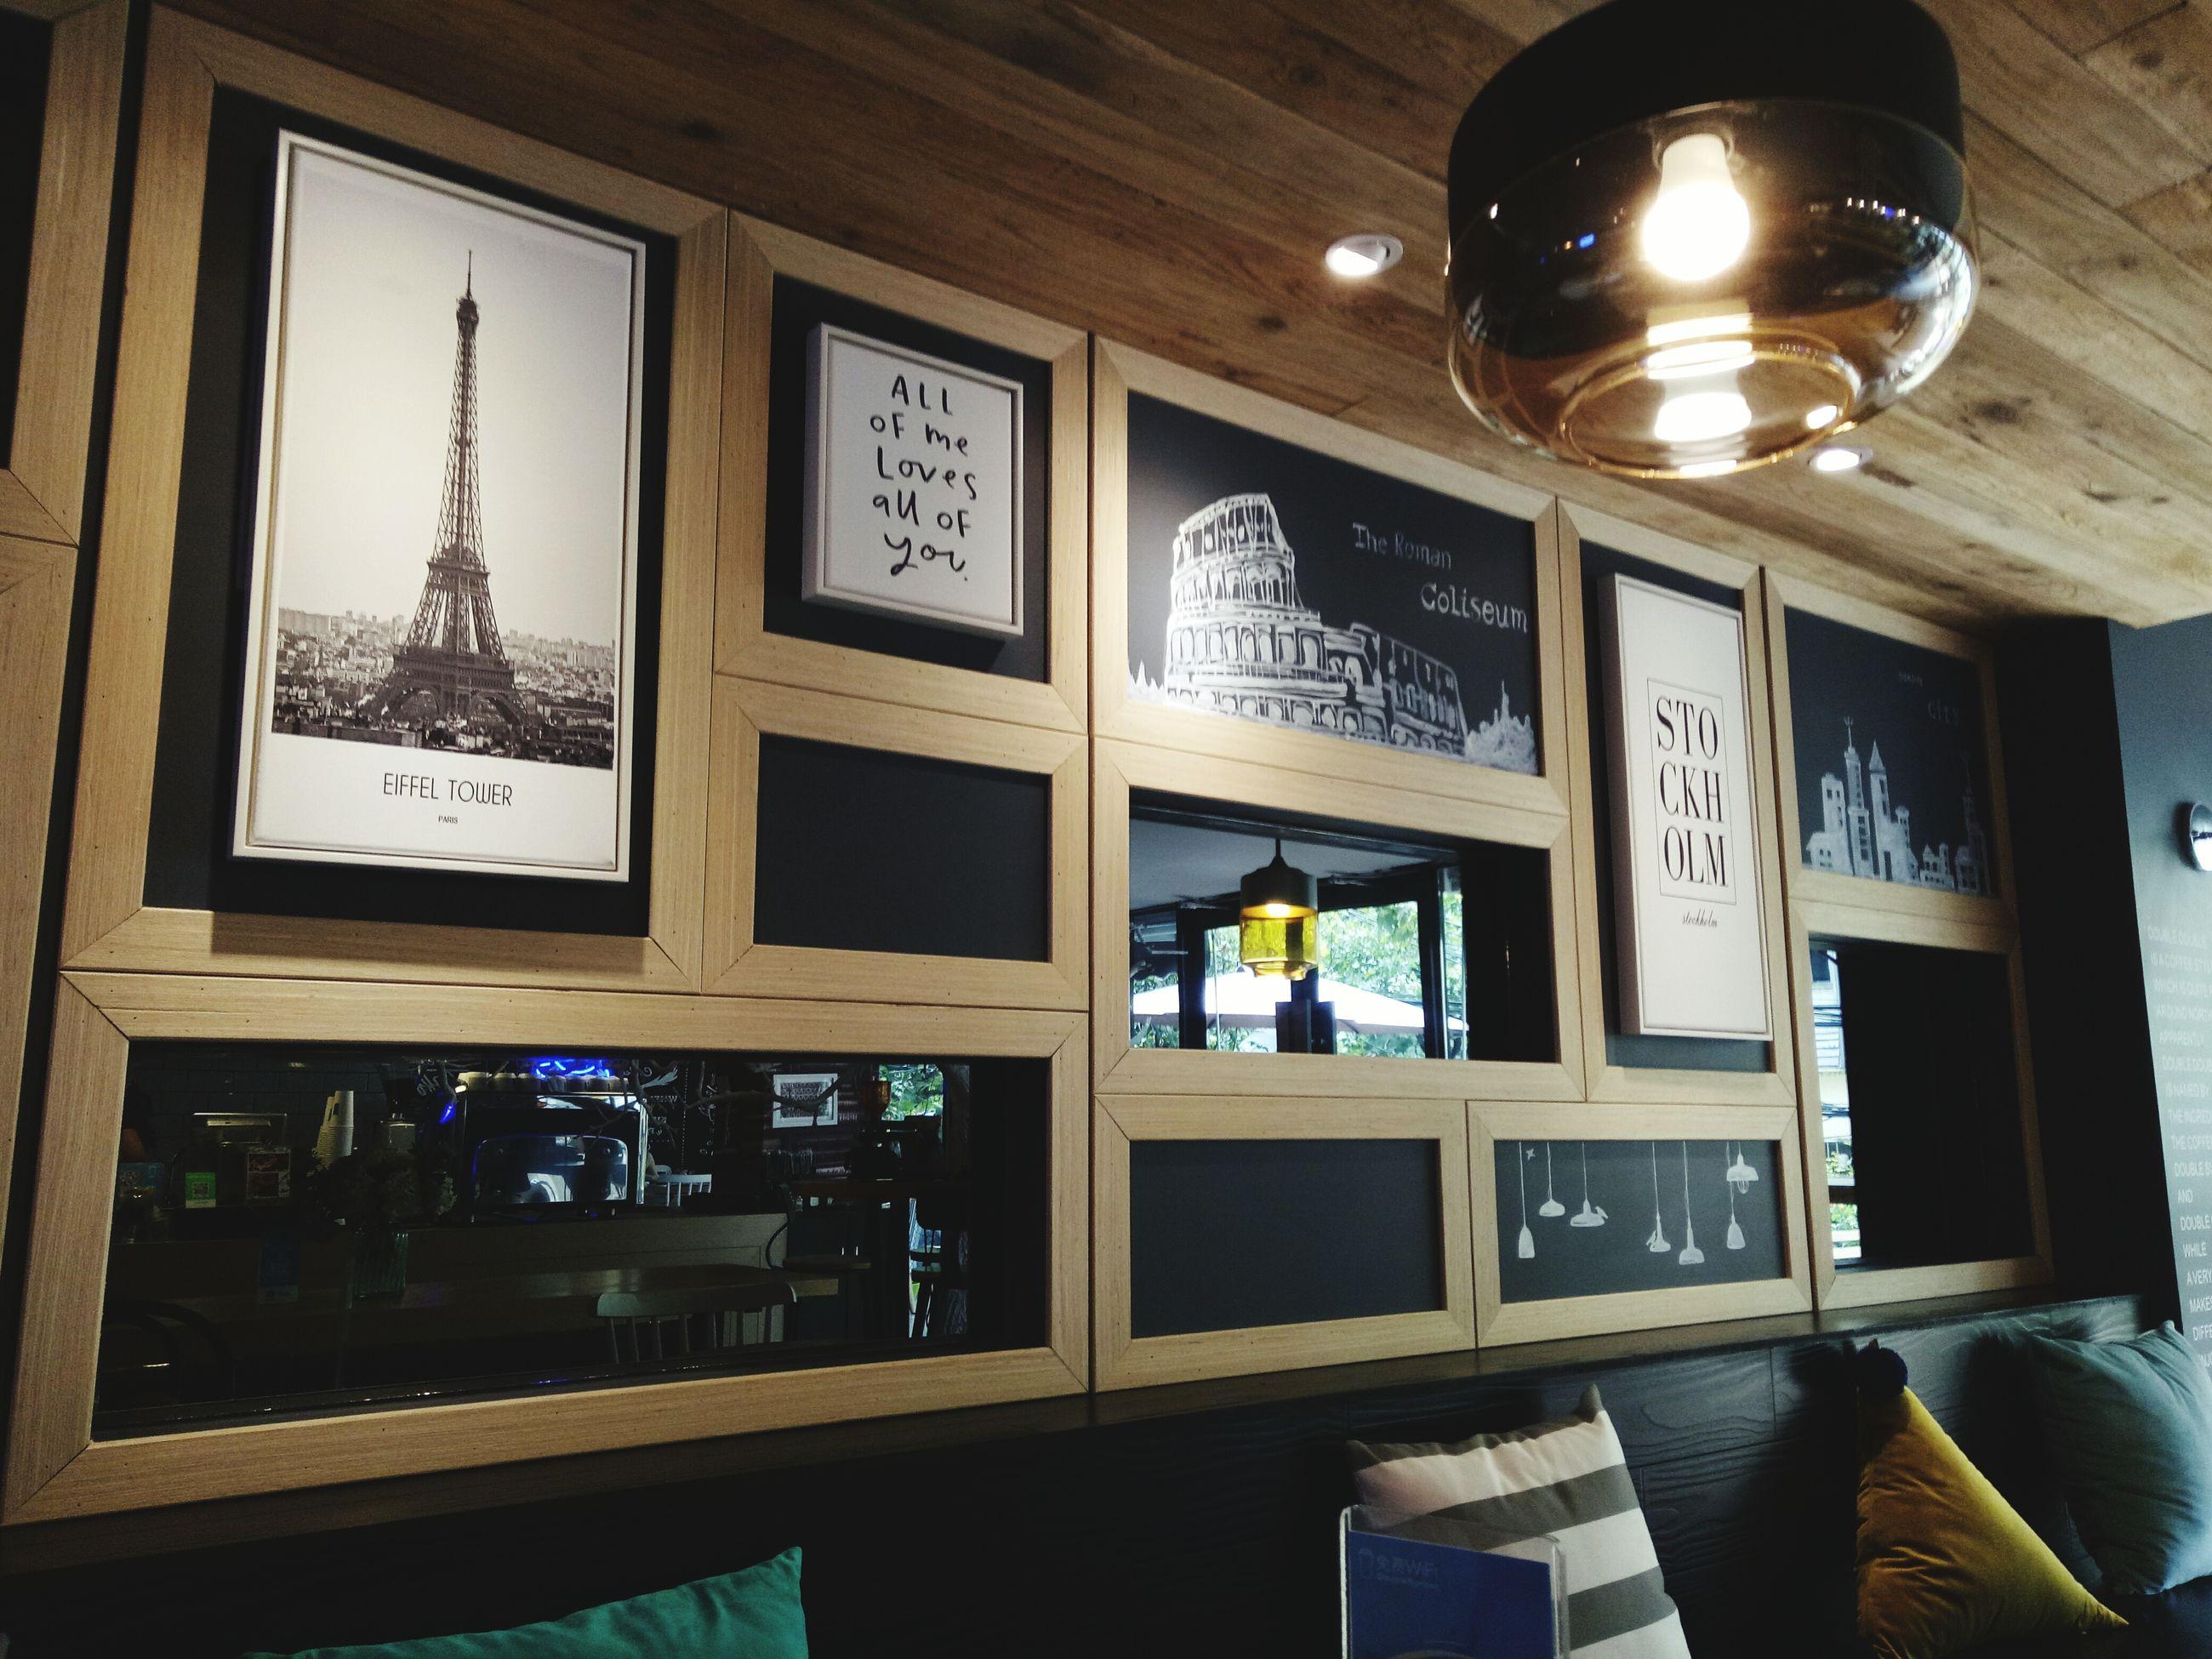 indoors, home showcase interior, shelf, home interior, no people, illuminated, architecture, day